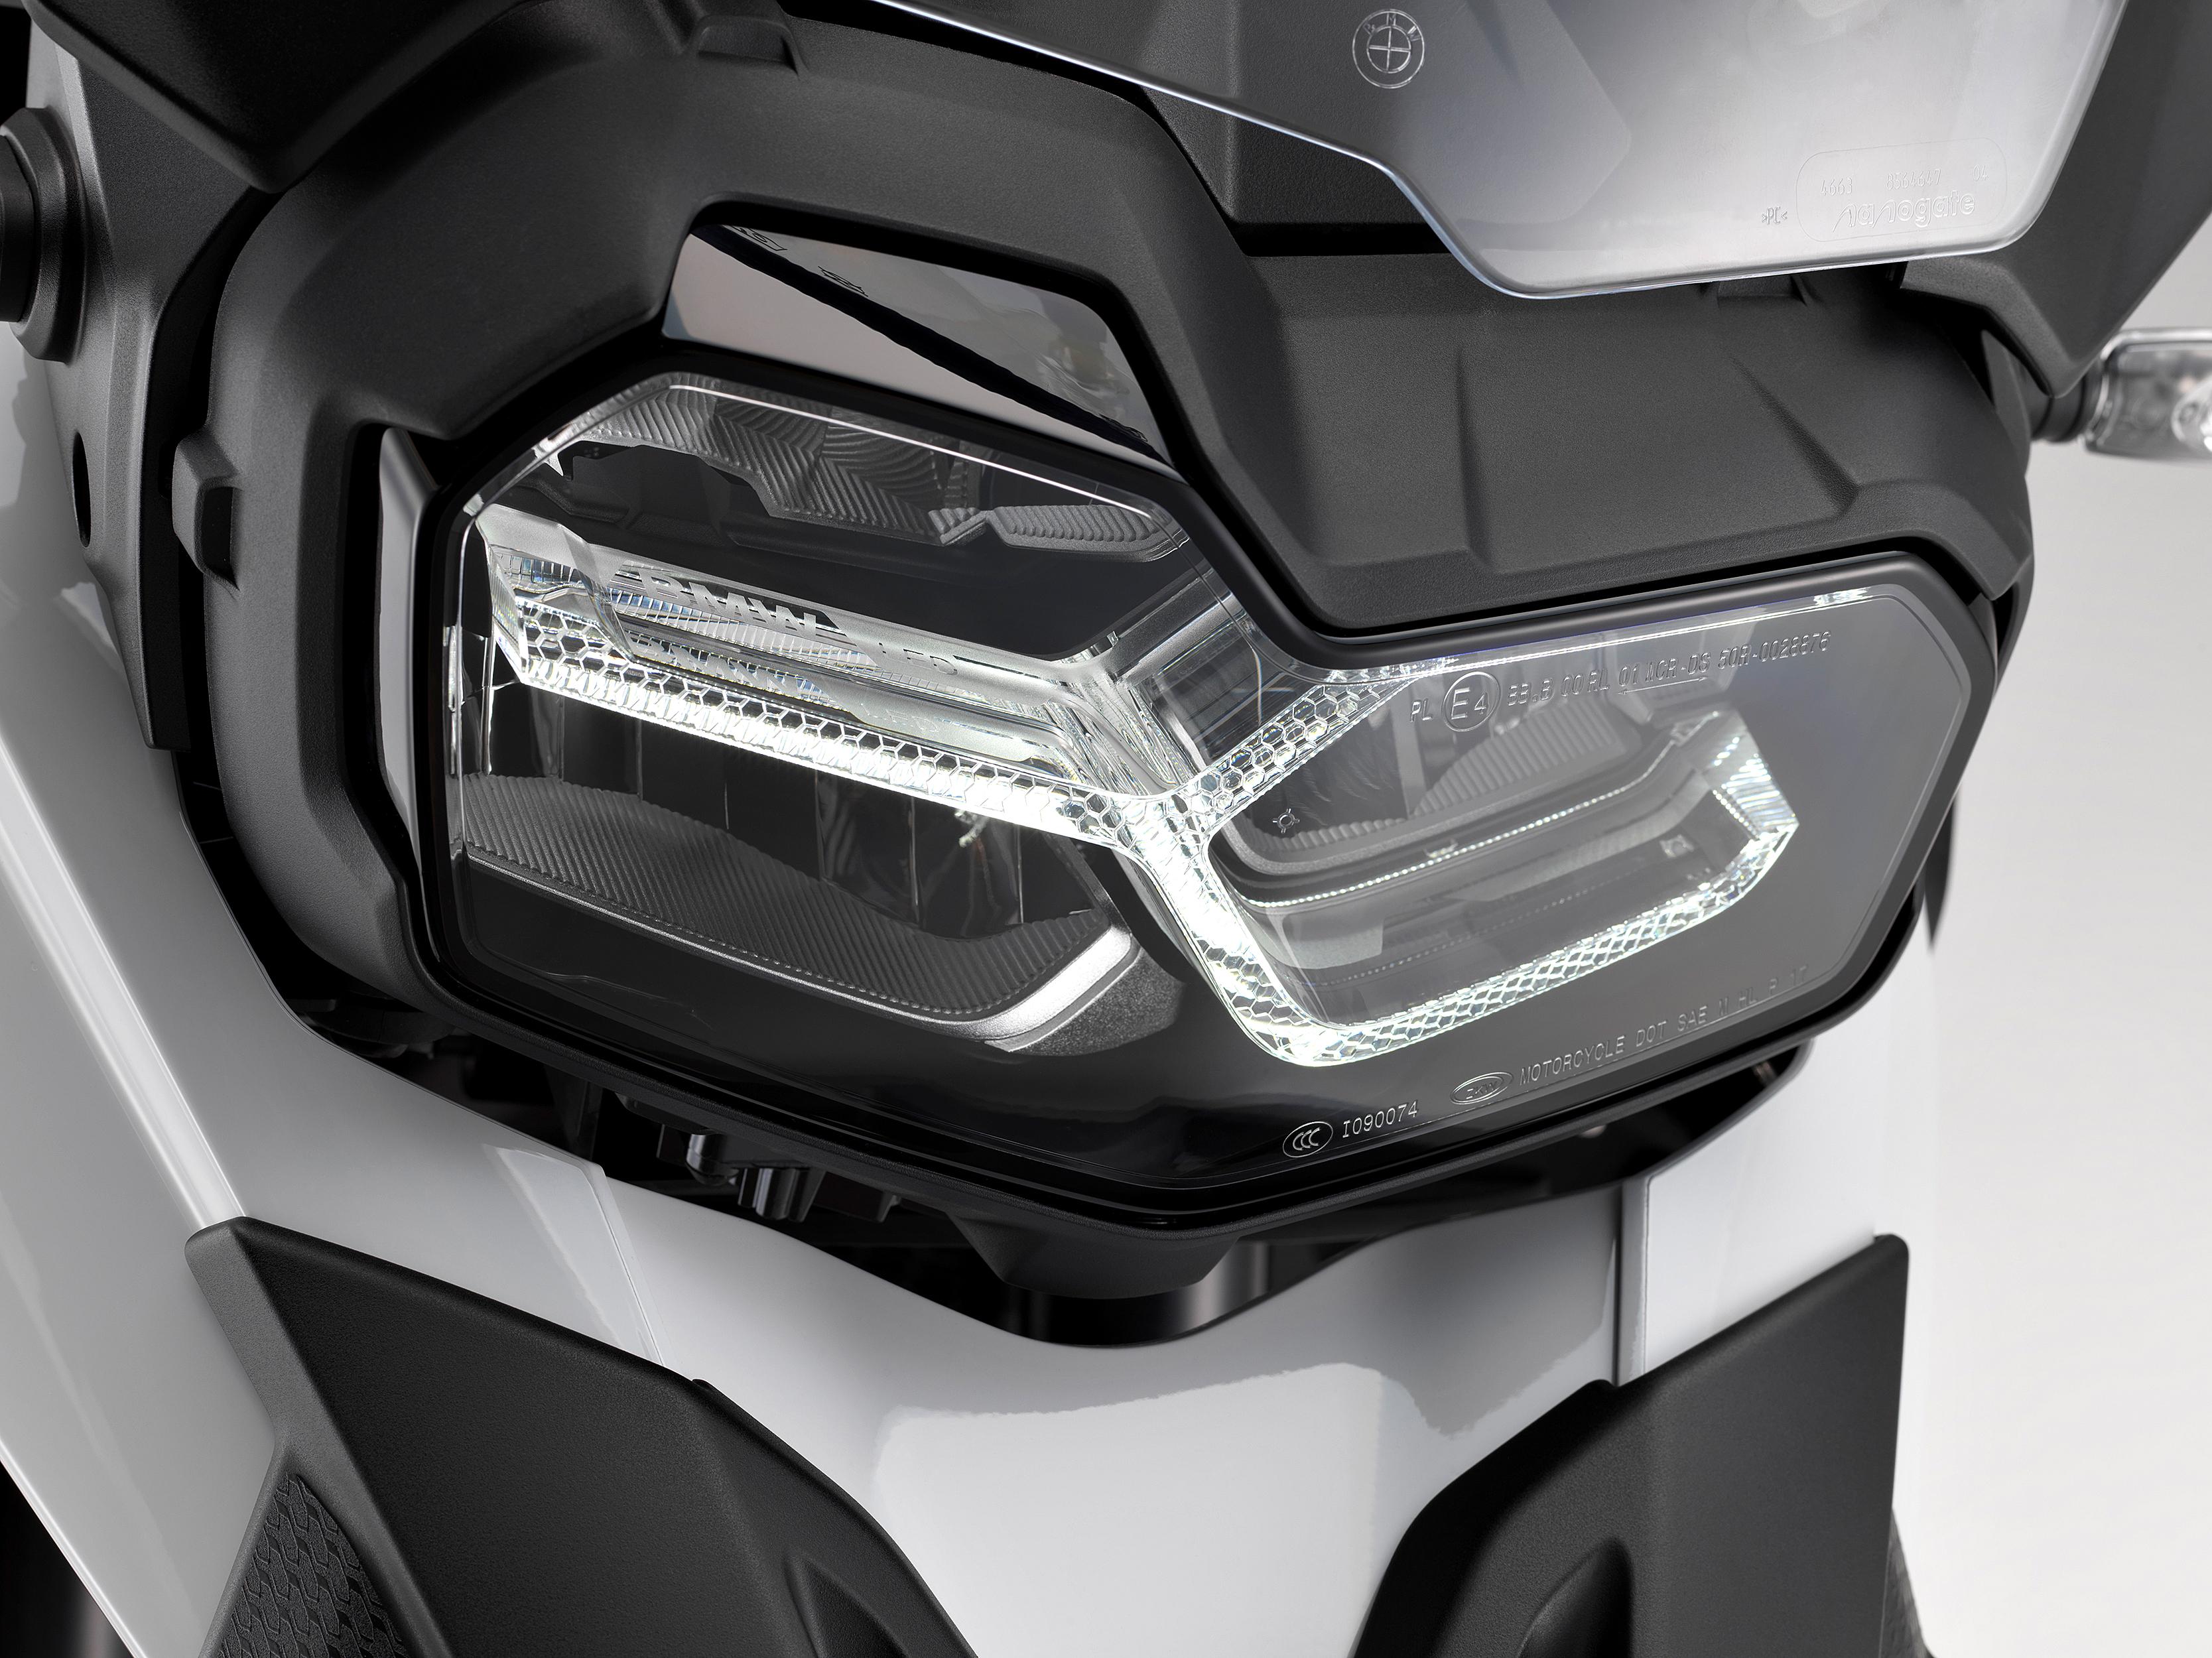 Prueba BMW 850 GS 2018 presentación MotorADN fotos prensa (132)